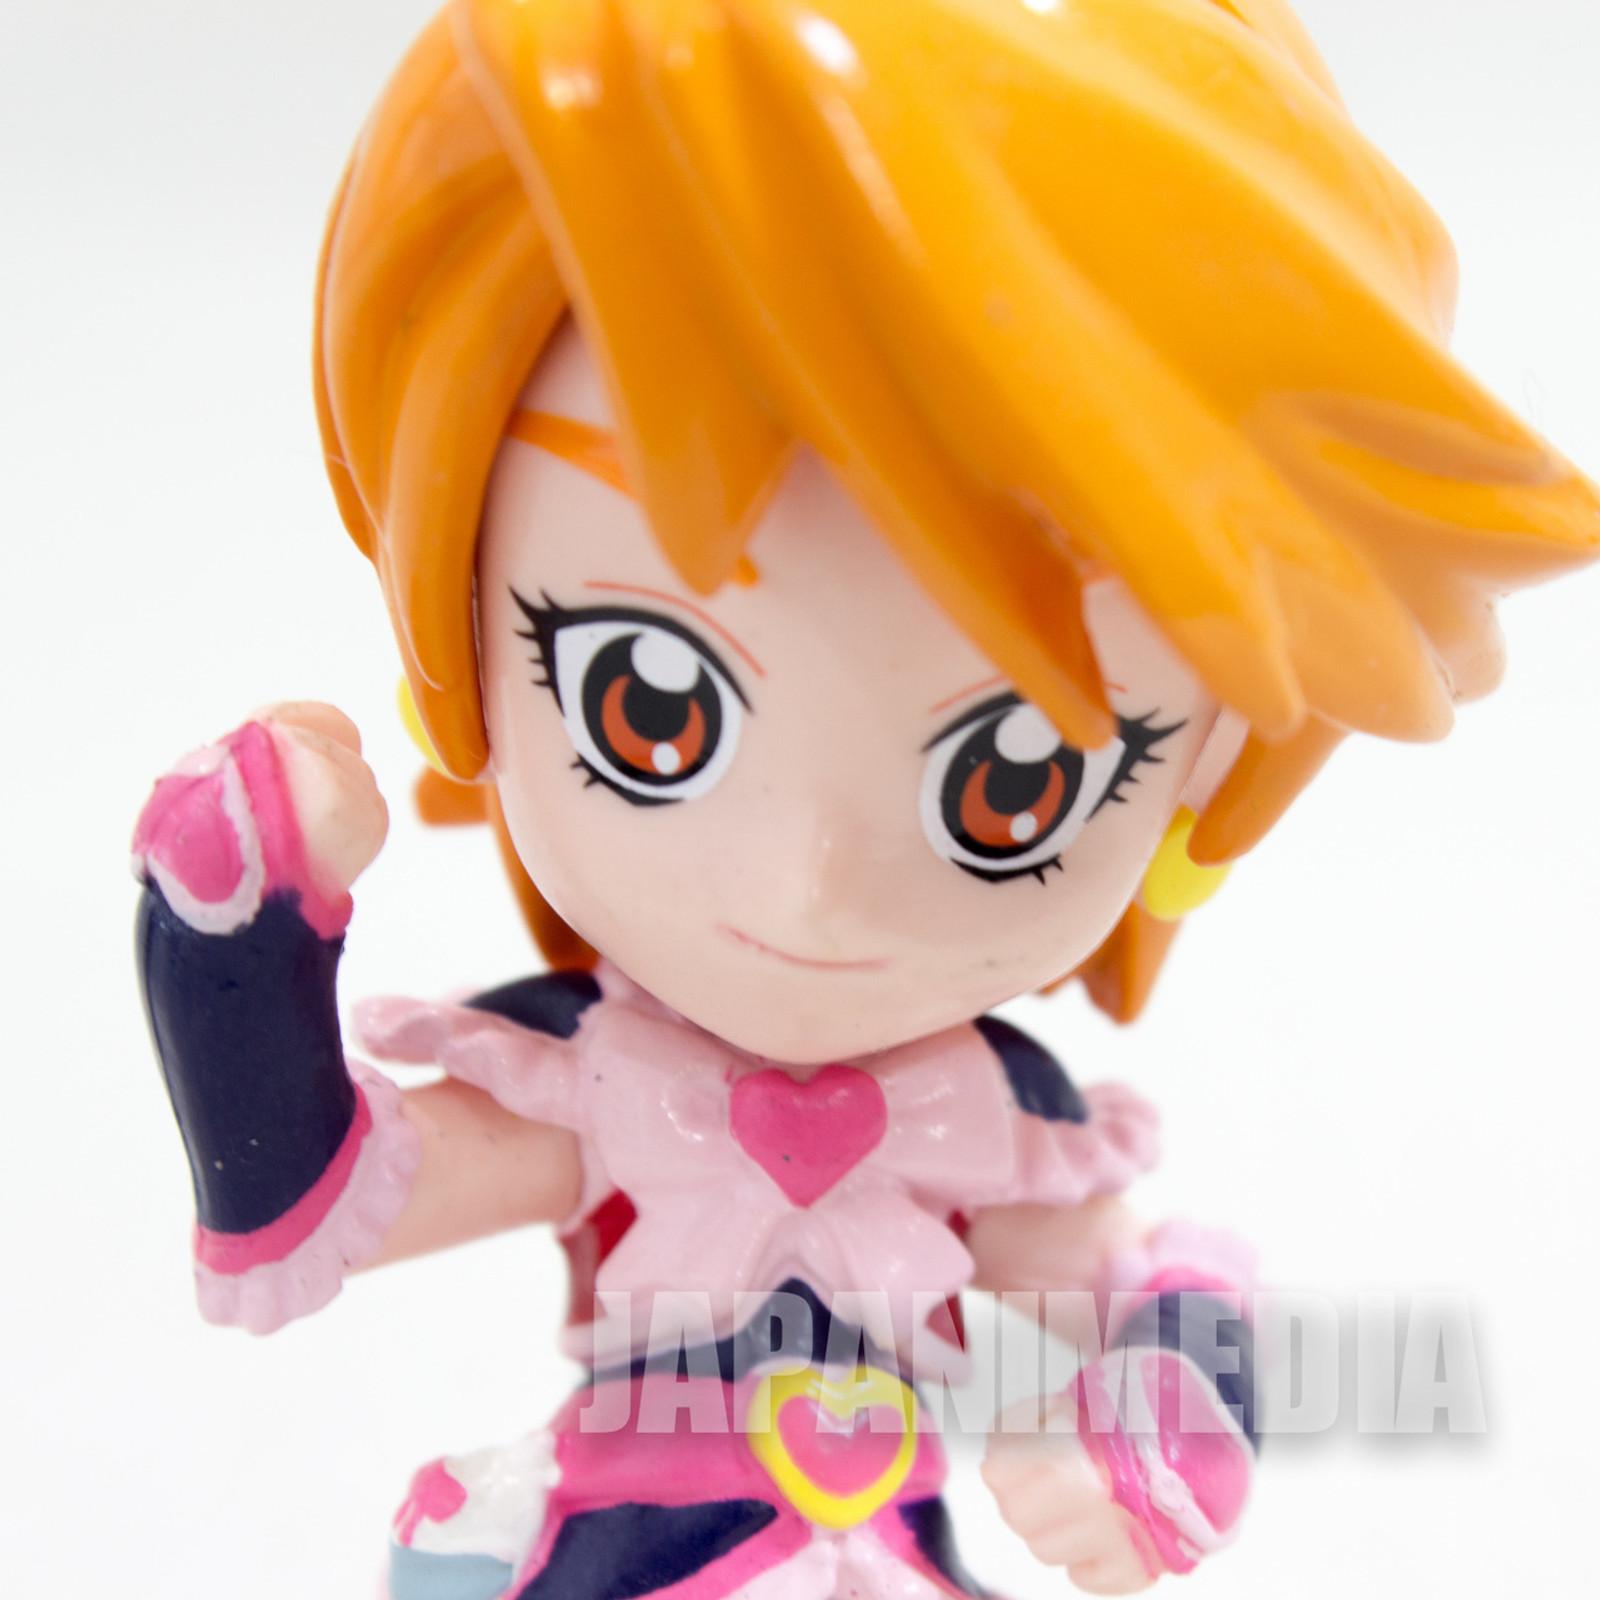 Futari wa Pretty Cure Max Heart Cure Black (Misumi Nagisa) Petit cute Figure JAPAN ANIME